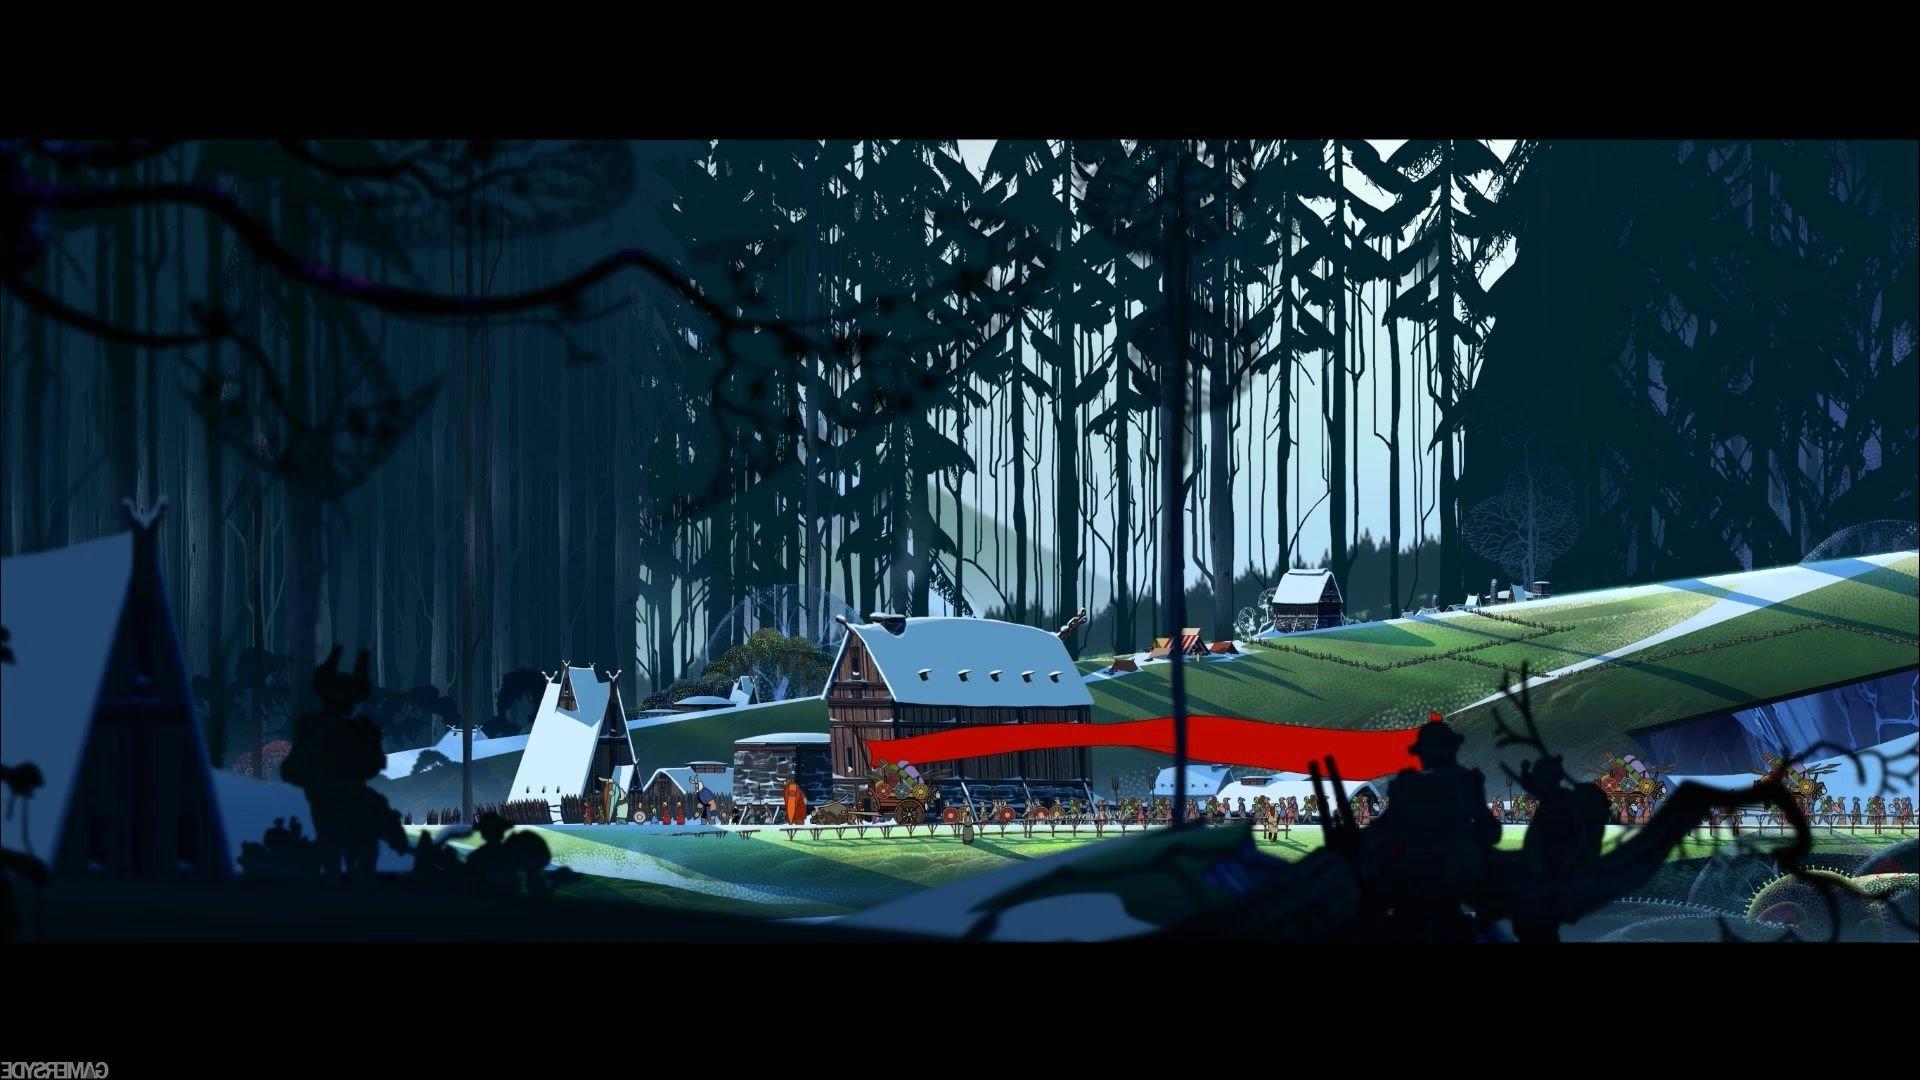 BANNER SAGA adventure fantasy tactical rpg viking fighting strategy 1920x1080